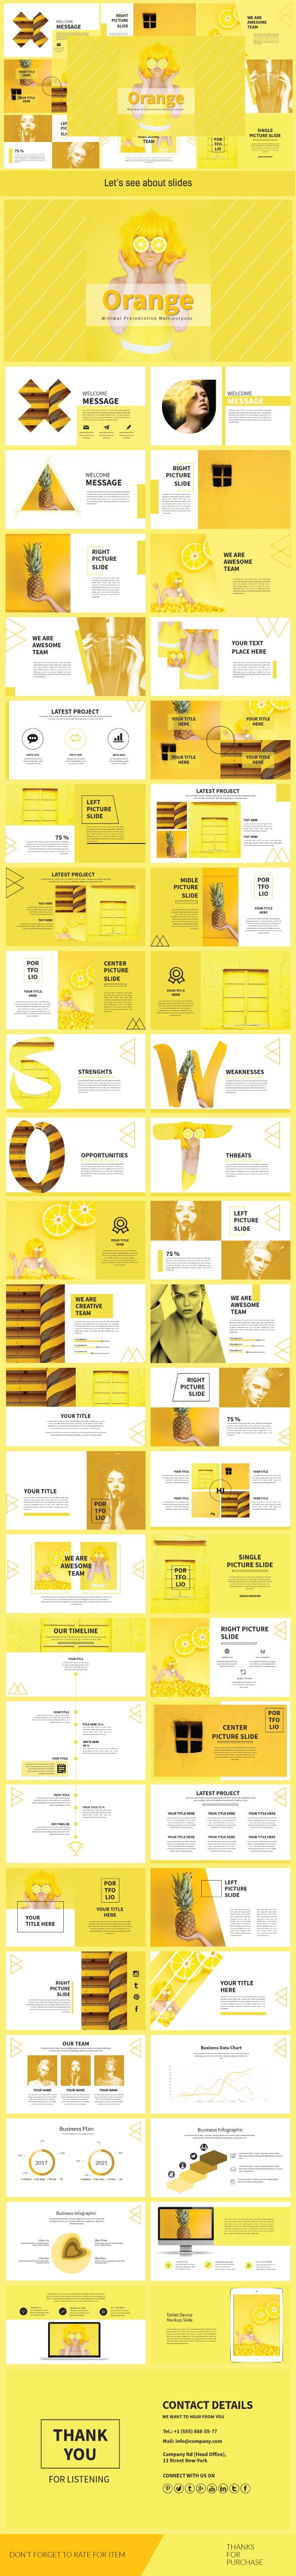 Orange Multipurpose Template - Creative PowerPoint Templates